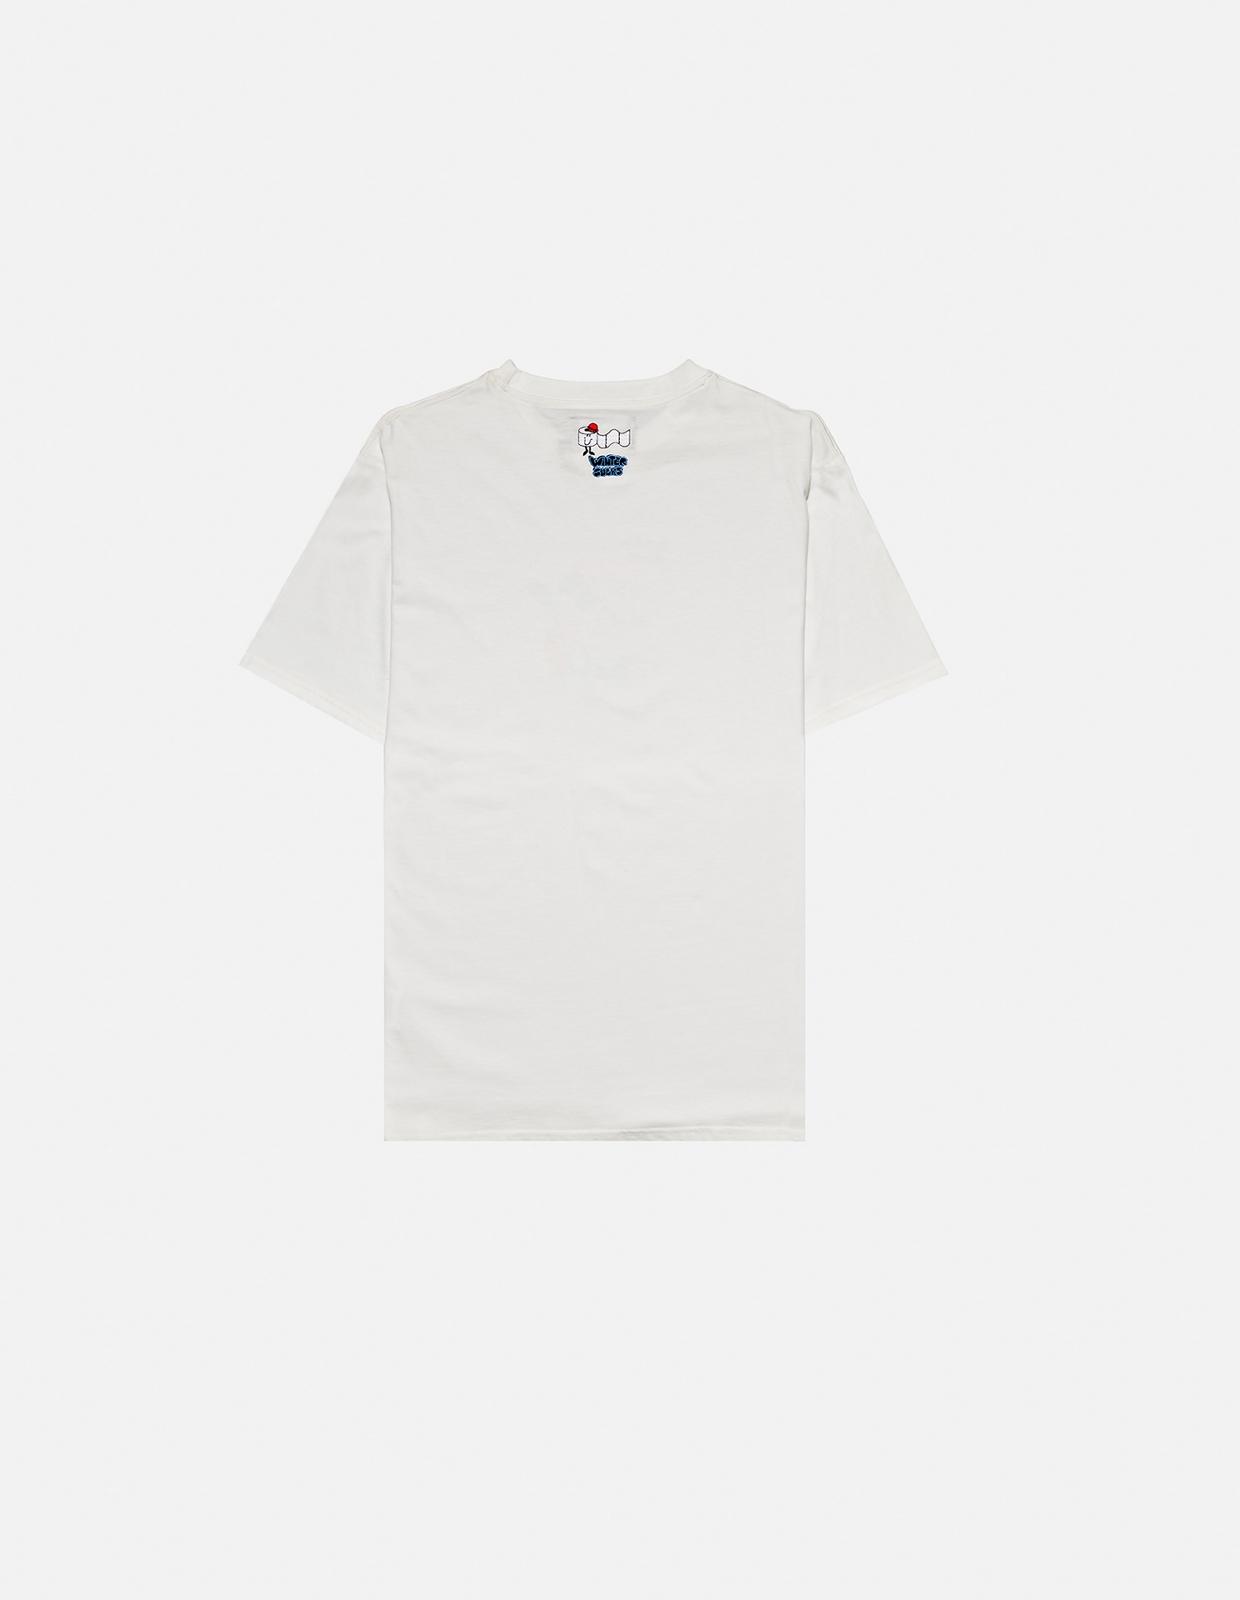 【PAS DE MER/パドゥメ】WINTER SUCKS T-SHIRT Tシャツ / CREAM